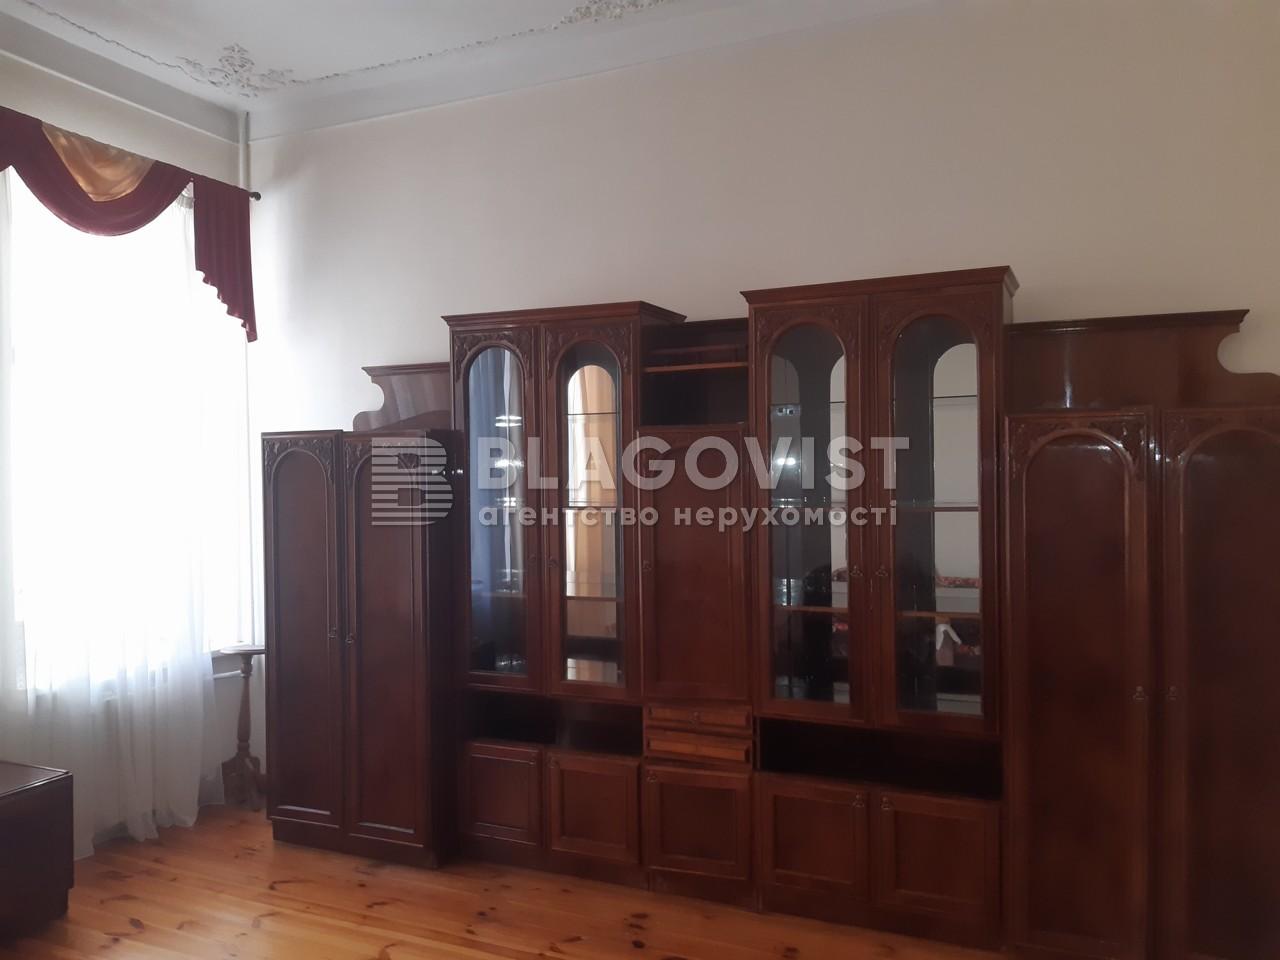 Квартира R-40017, Саксаганского, 36, Киев - Фото 6